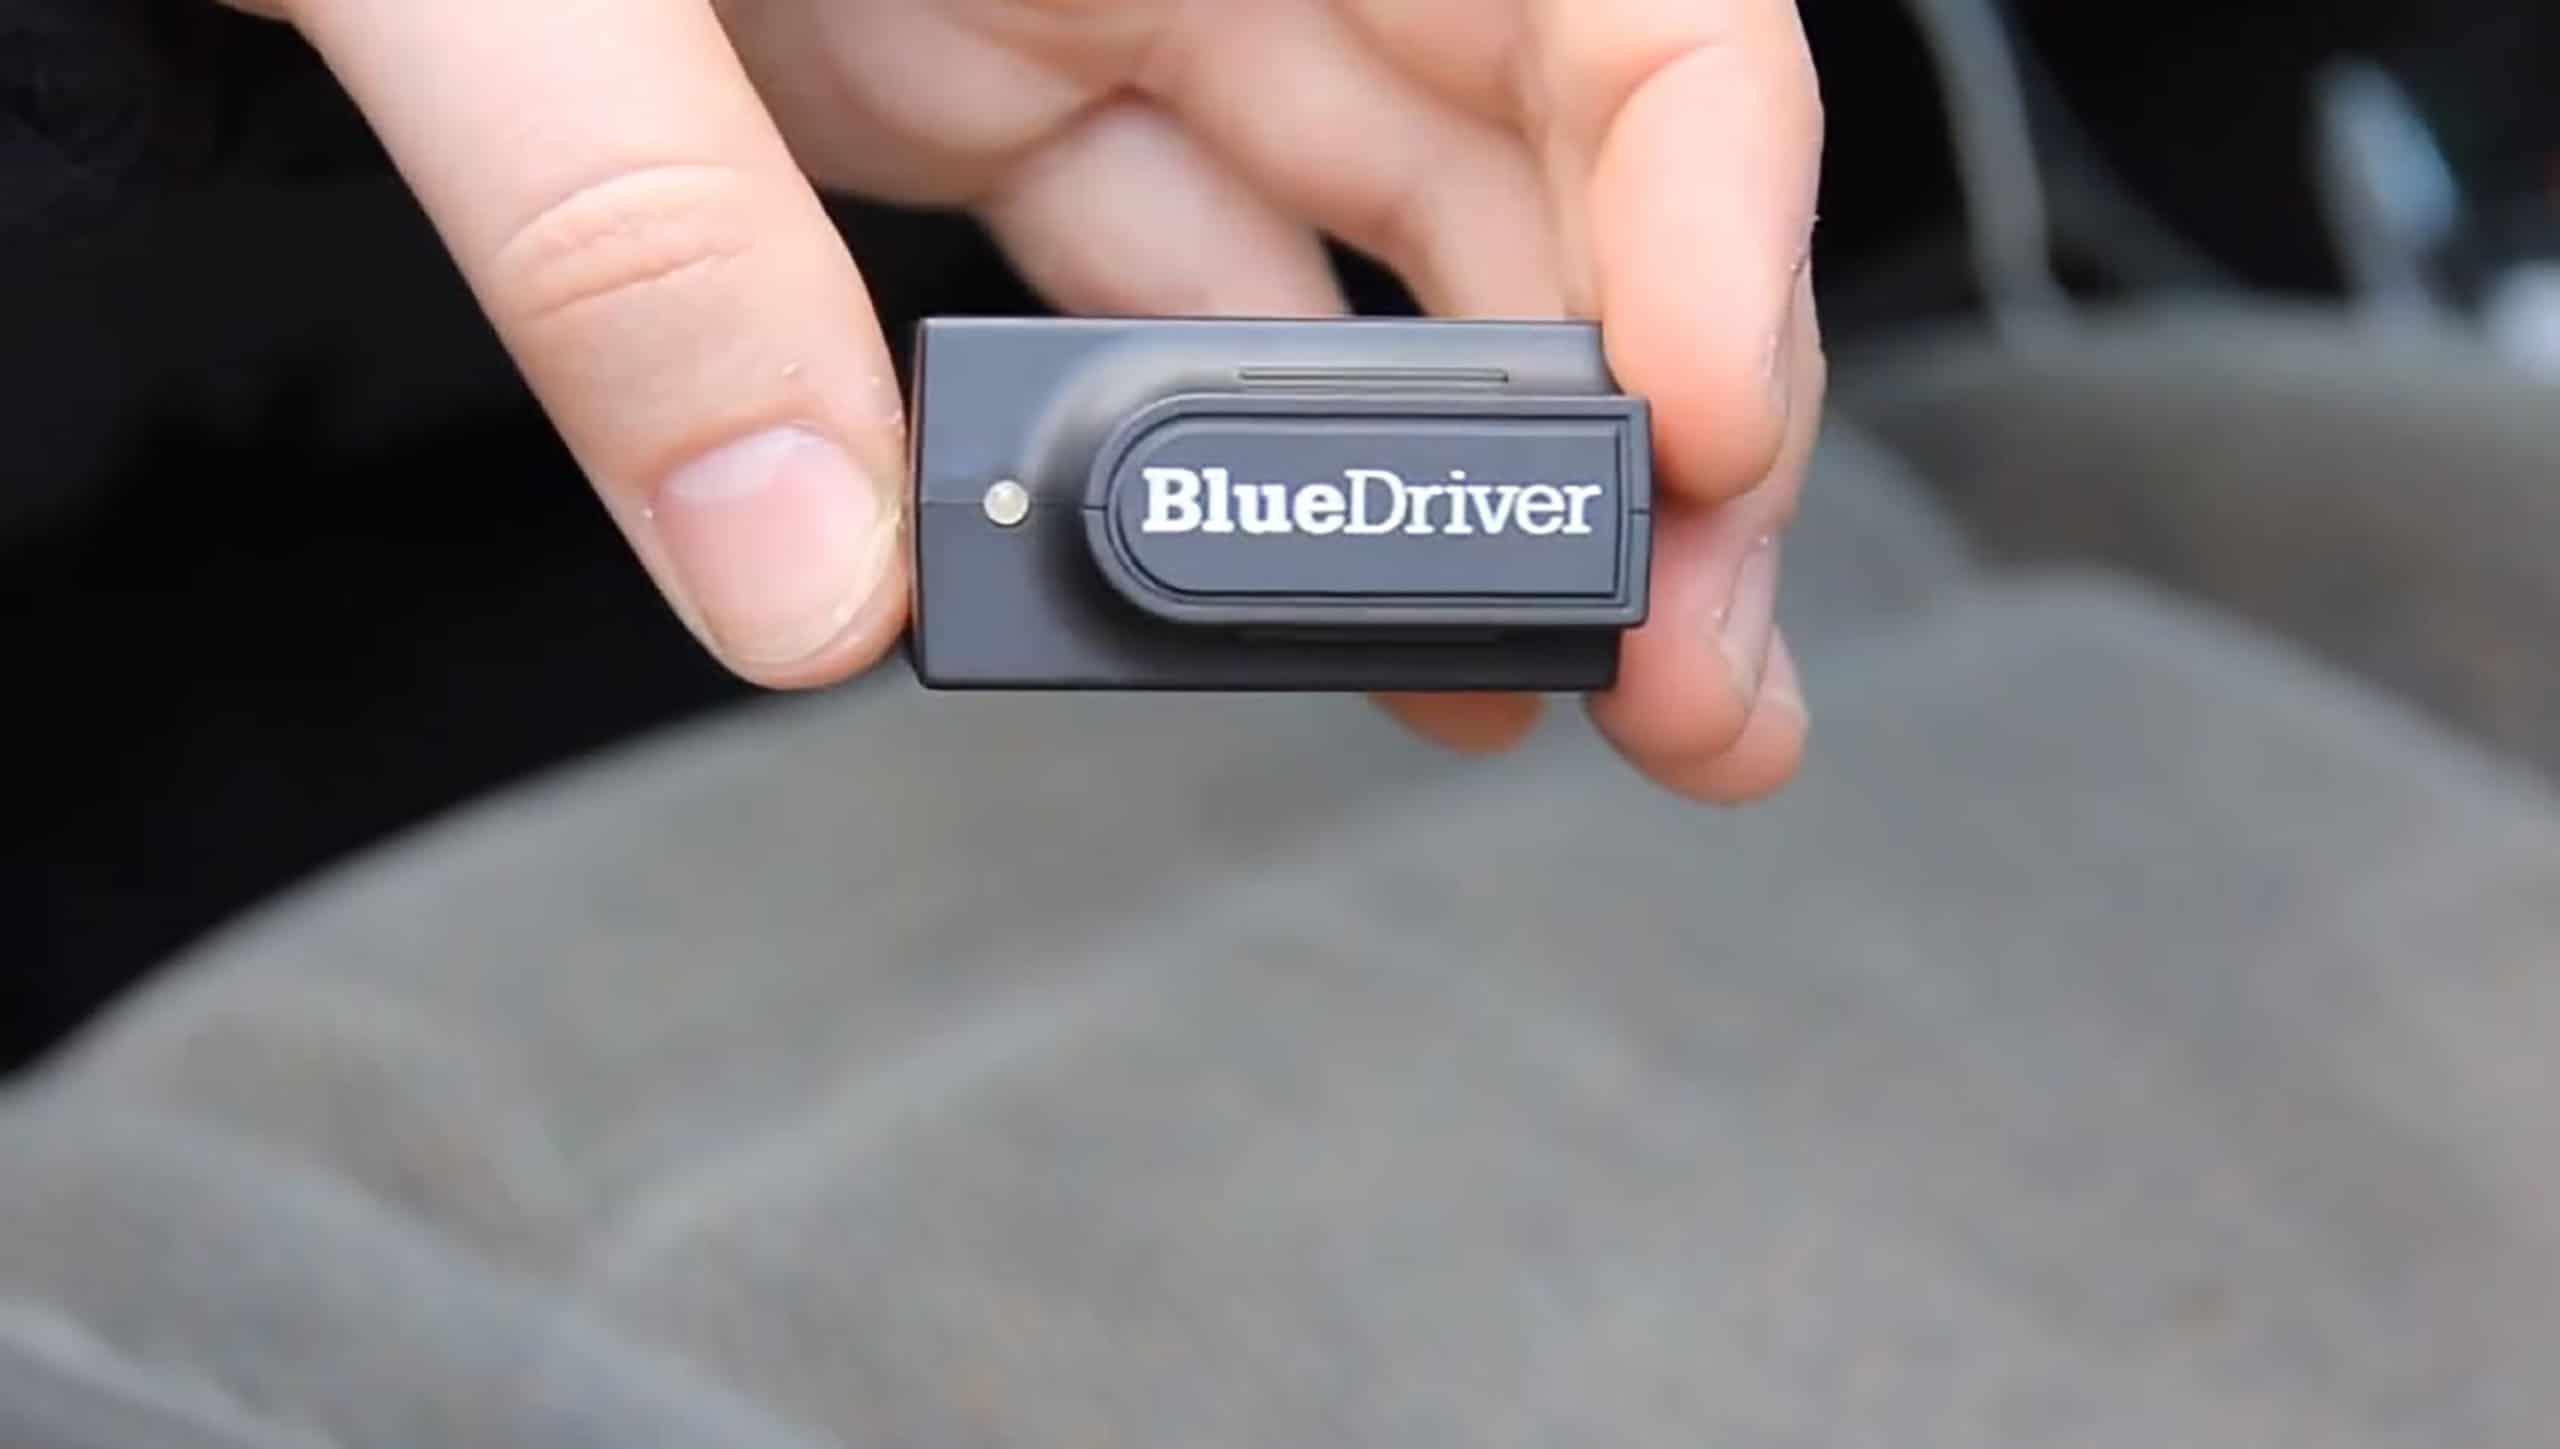 300dpi BlueDriverSensorInHand scaled